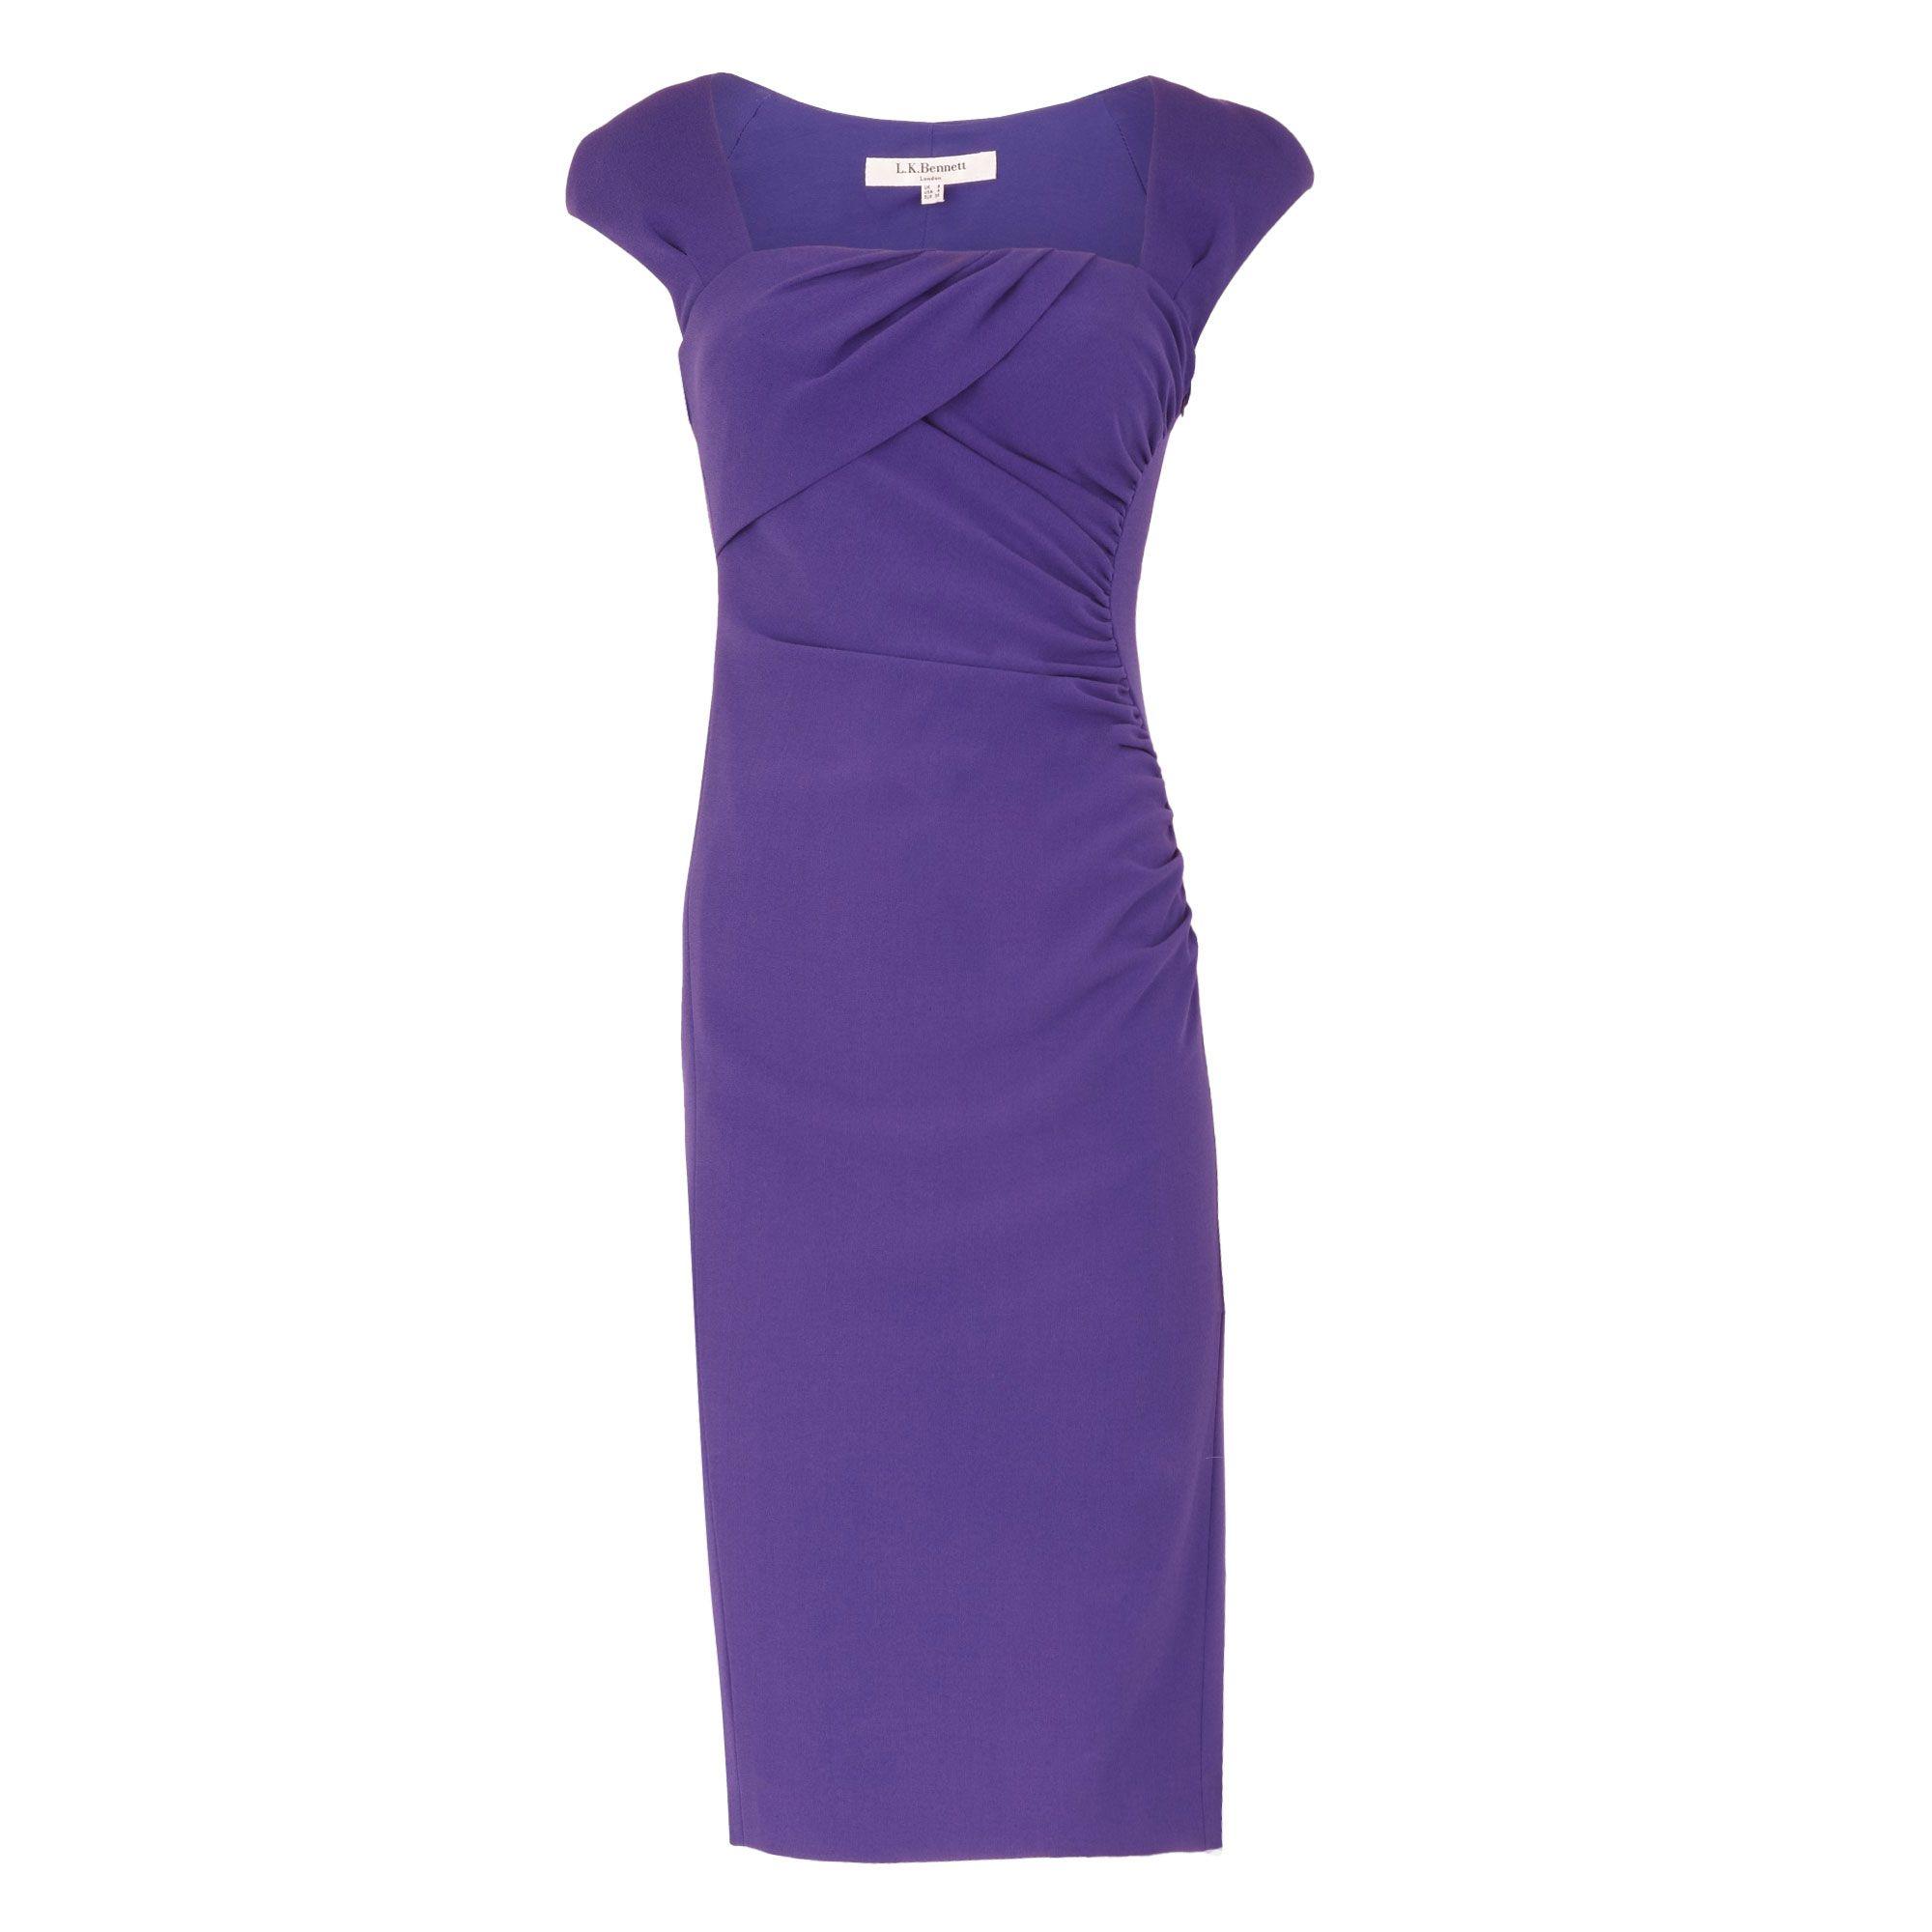 Tina Dress Regalia L.K.Bennett | Fashion | Pinterest